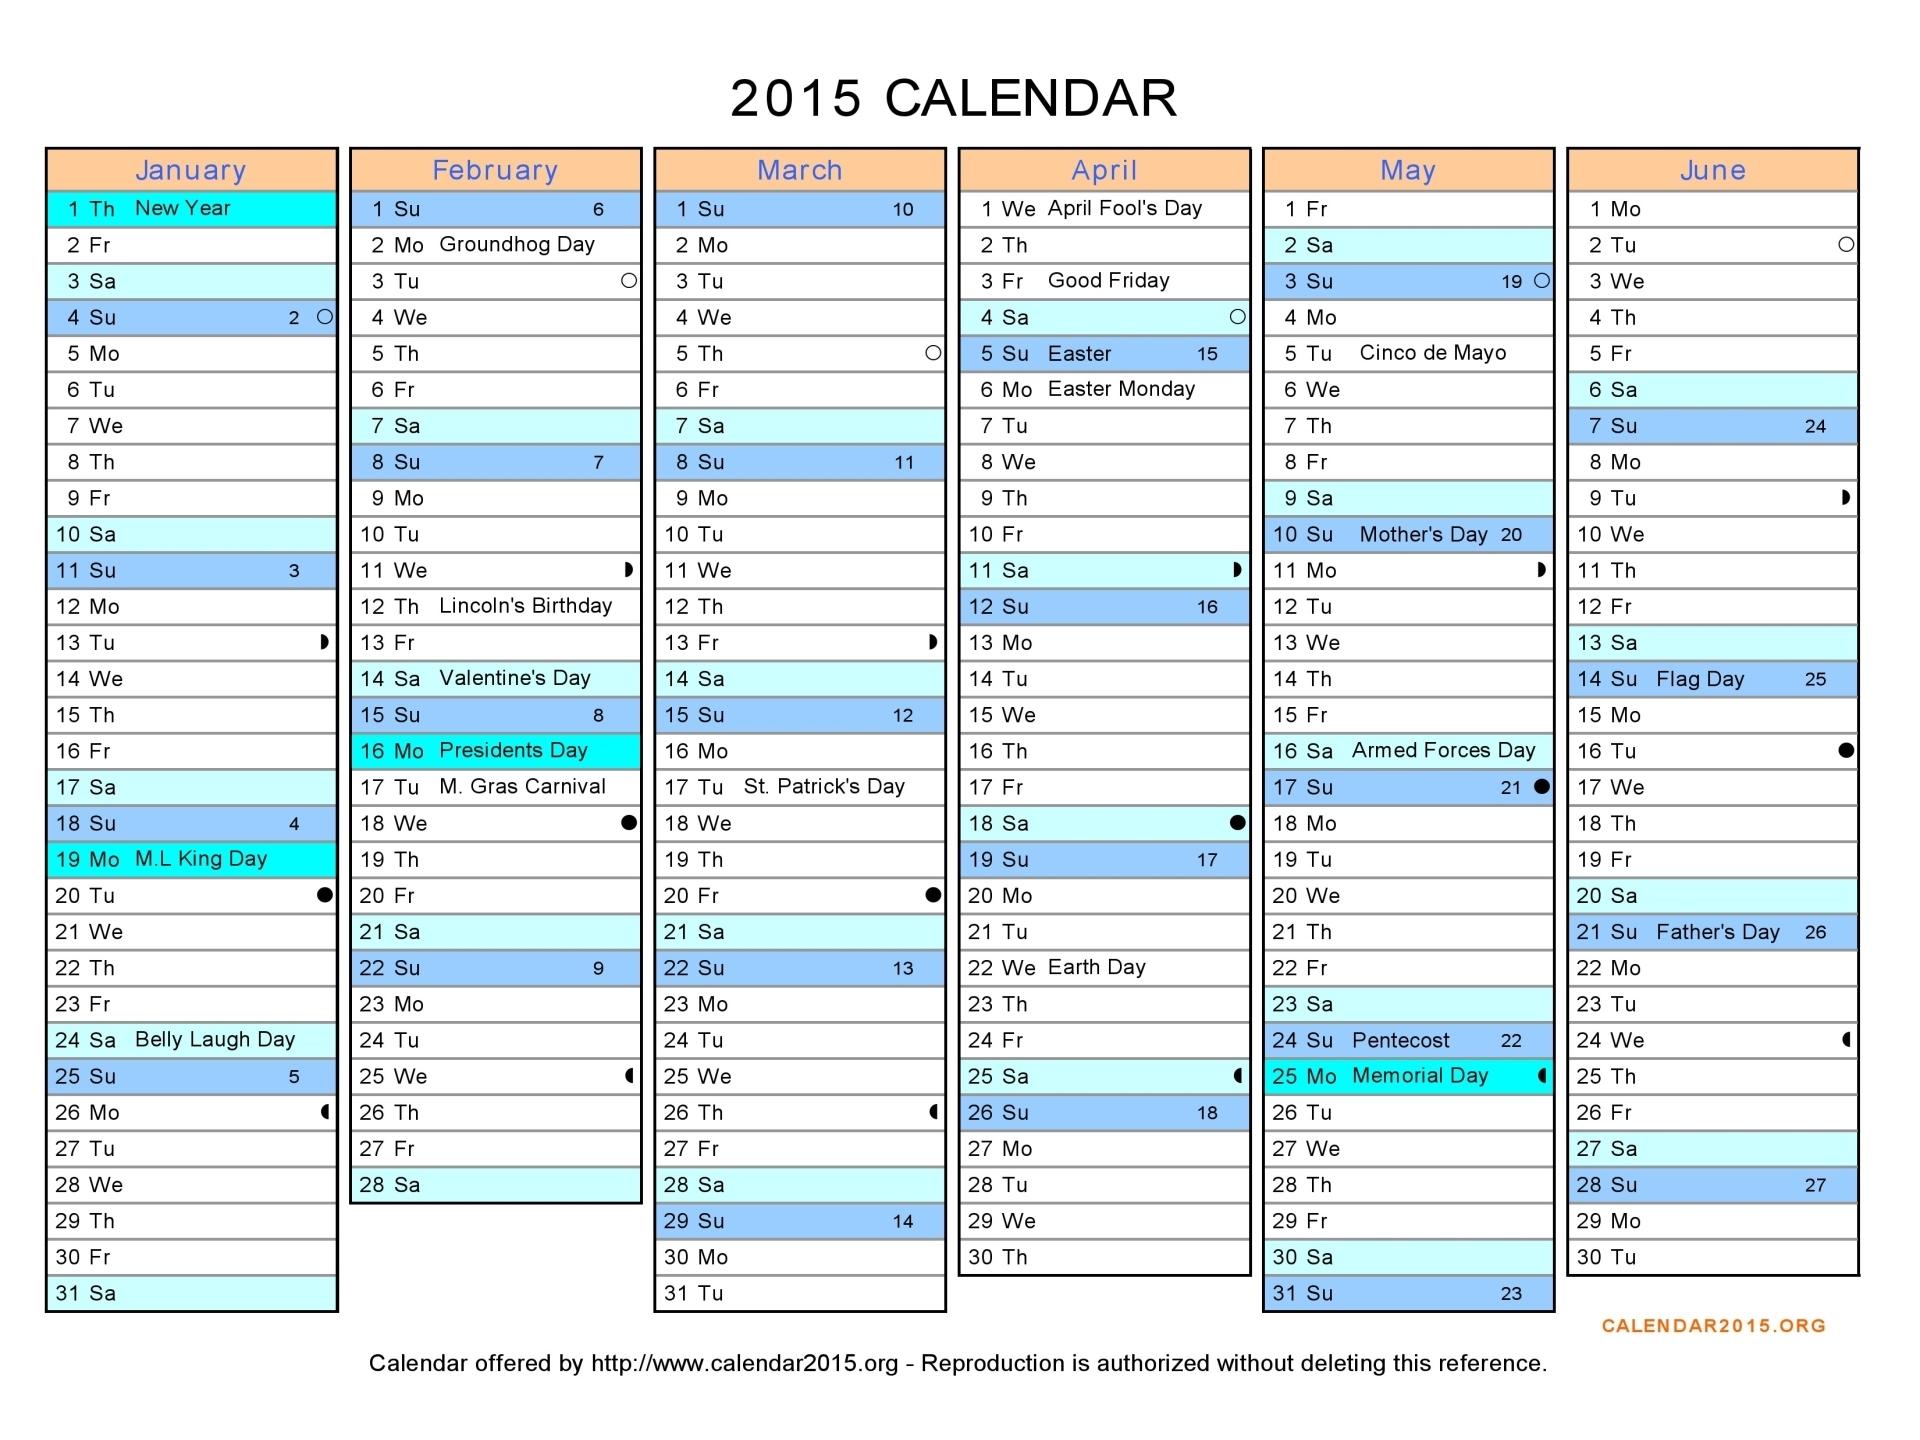 2015 Calendar In Excel - Free Printable Calendar Templates | Chainimage regarding Free Excel Calendar Templates